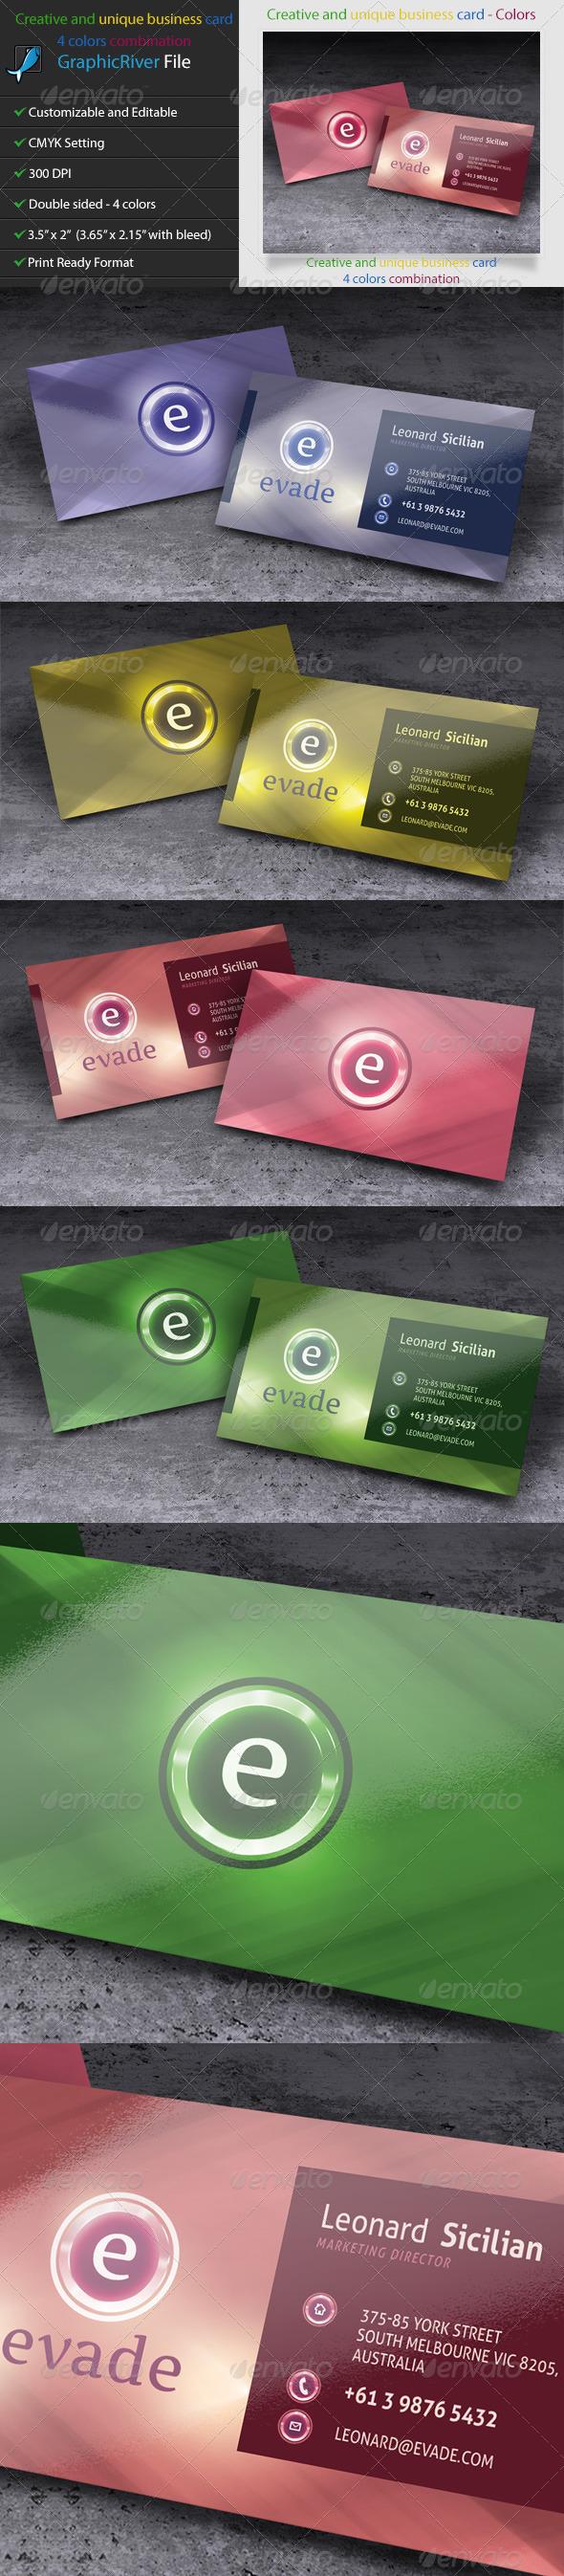 GraphicRiver Creative and unique business card 2 5281617